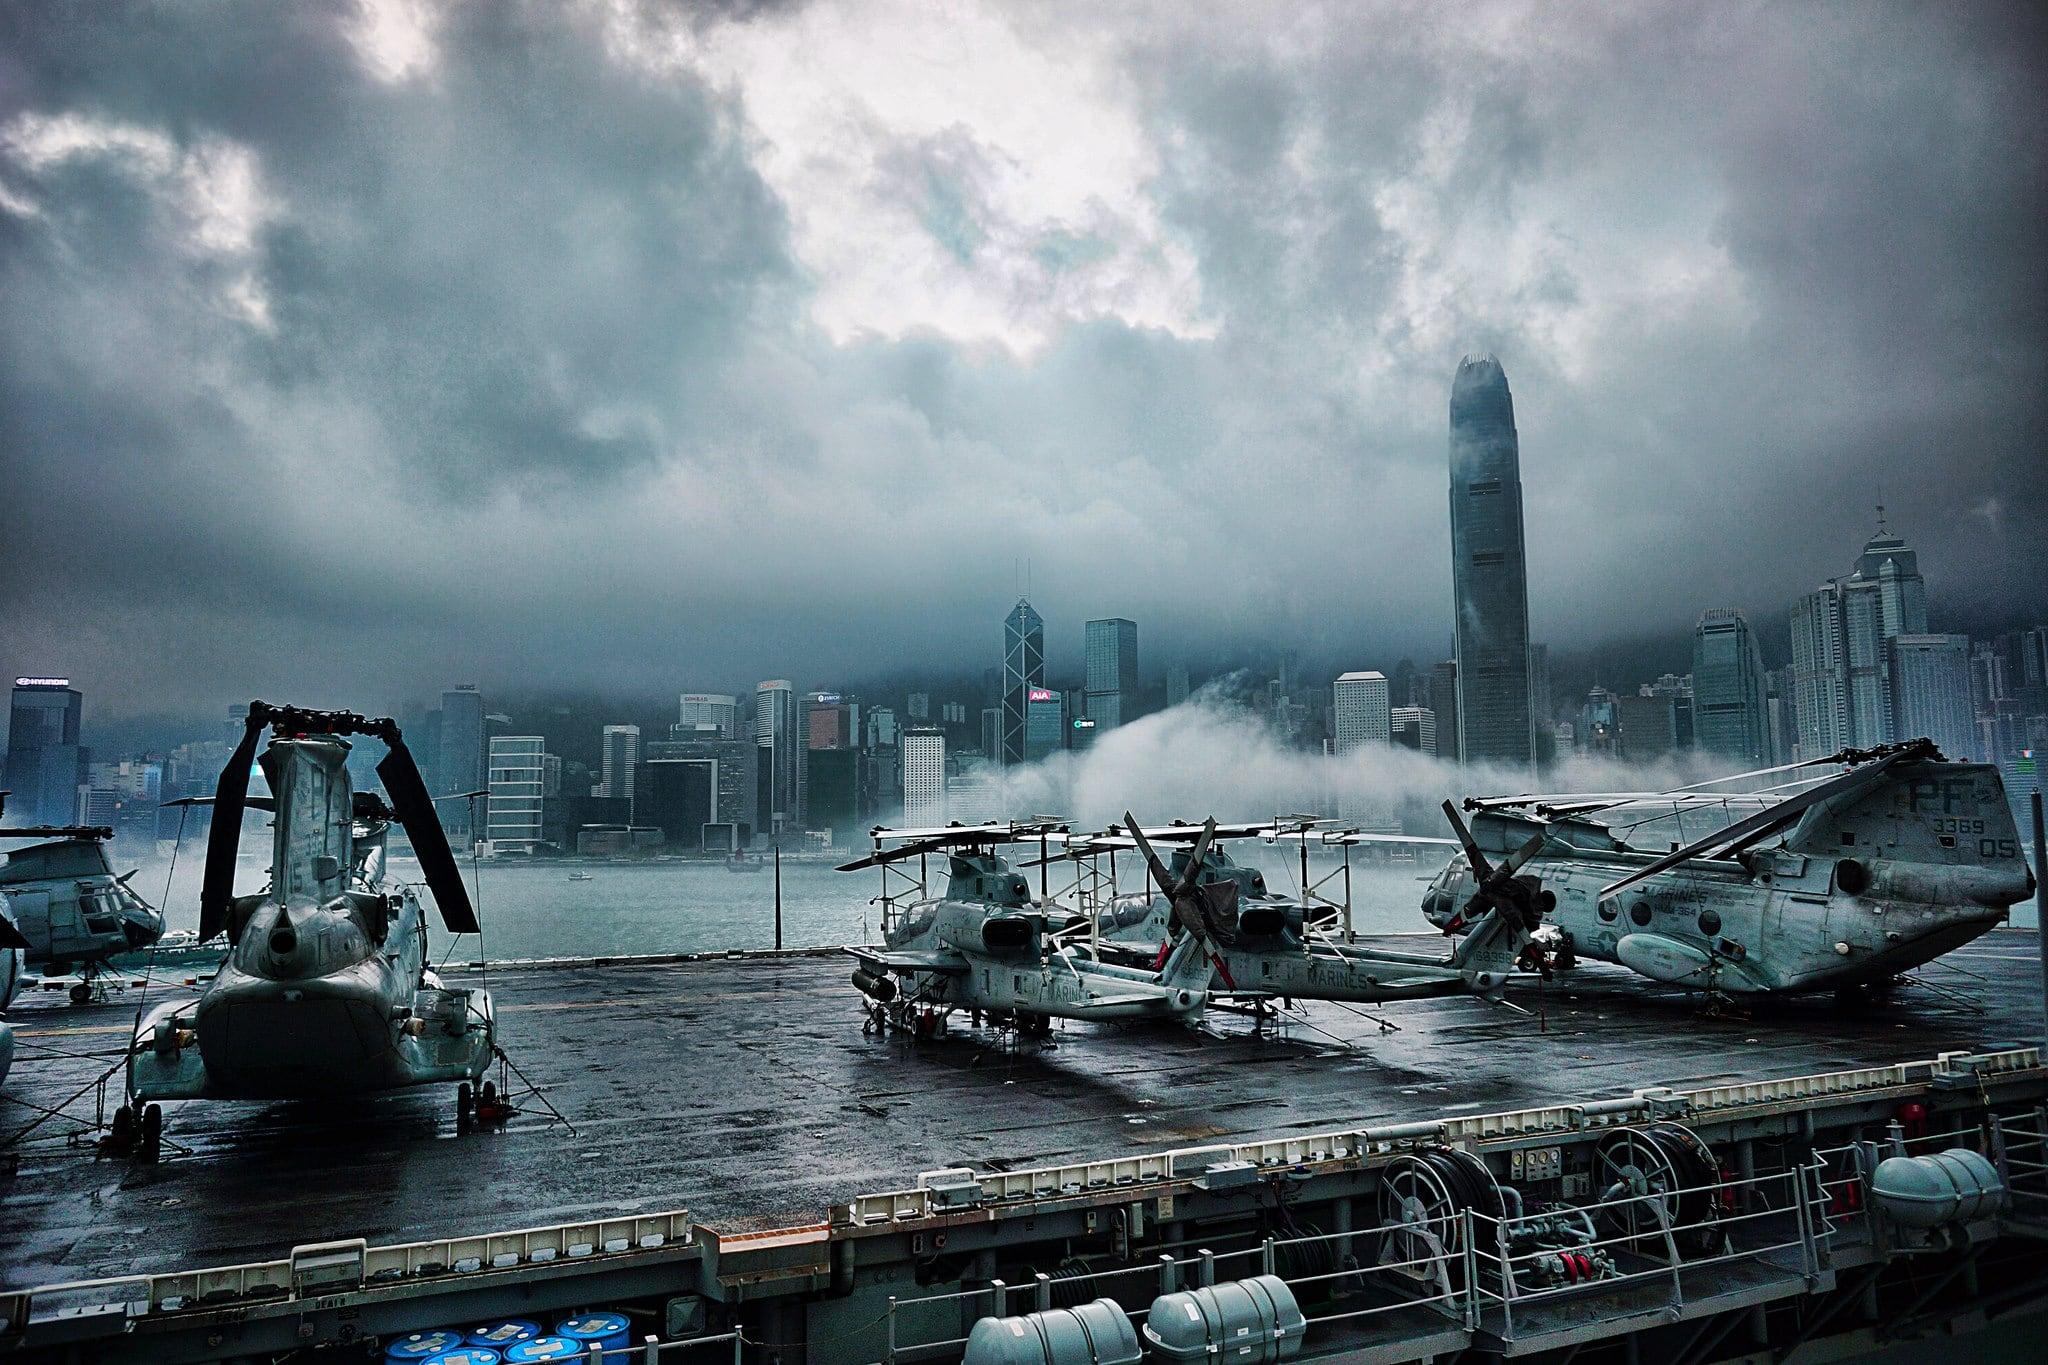 USS Peleliu (Amphibious Assault Vessel) at Victoria Harbor, Hong Kong